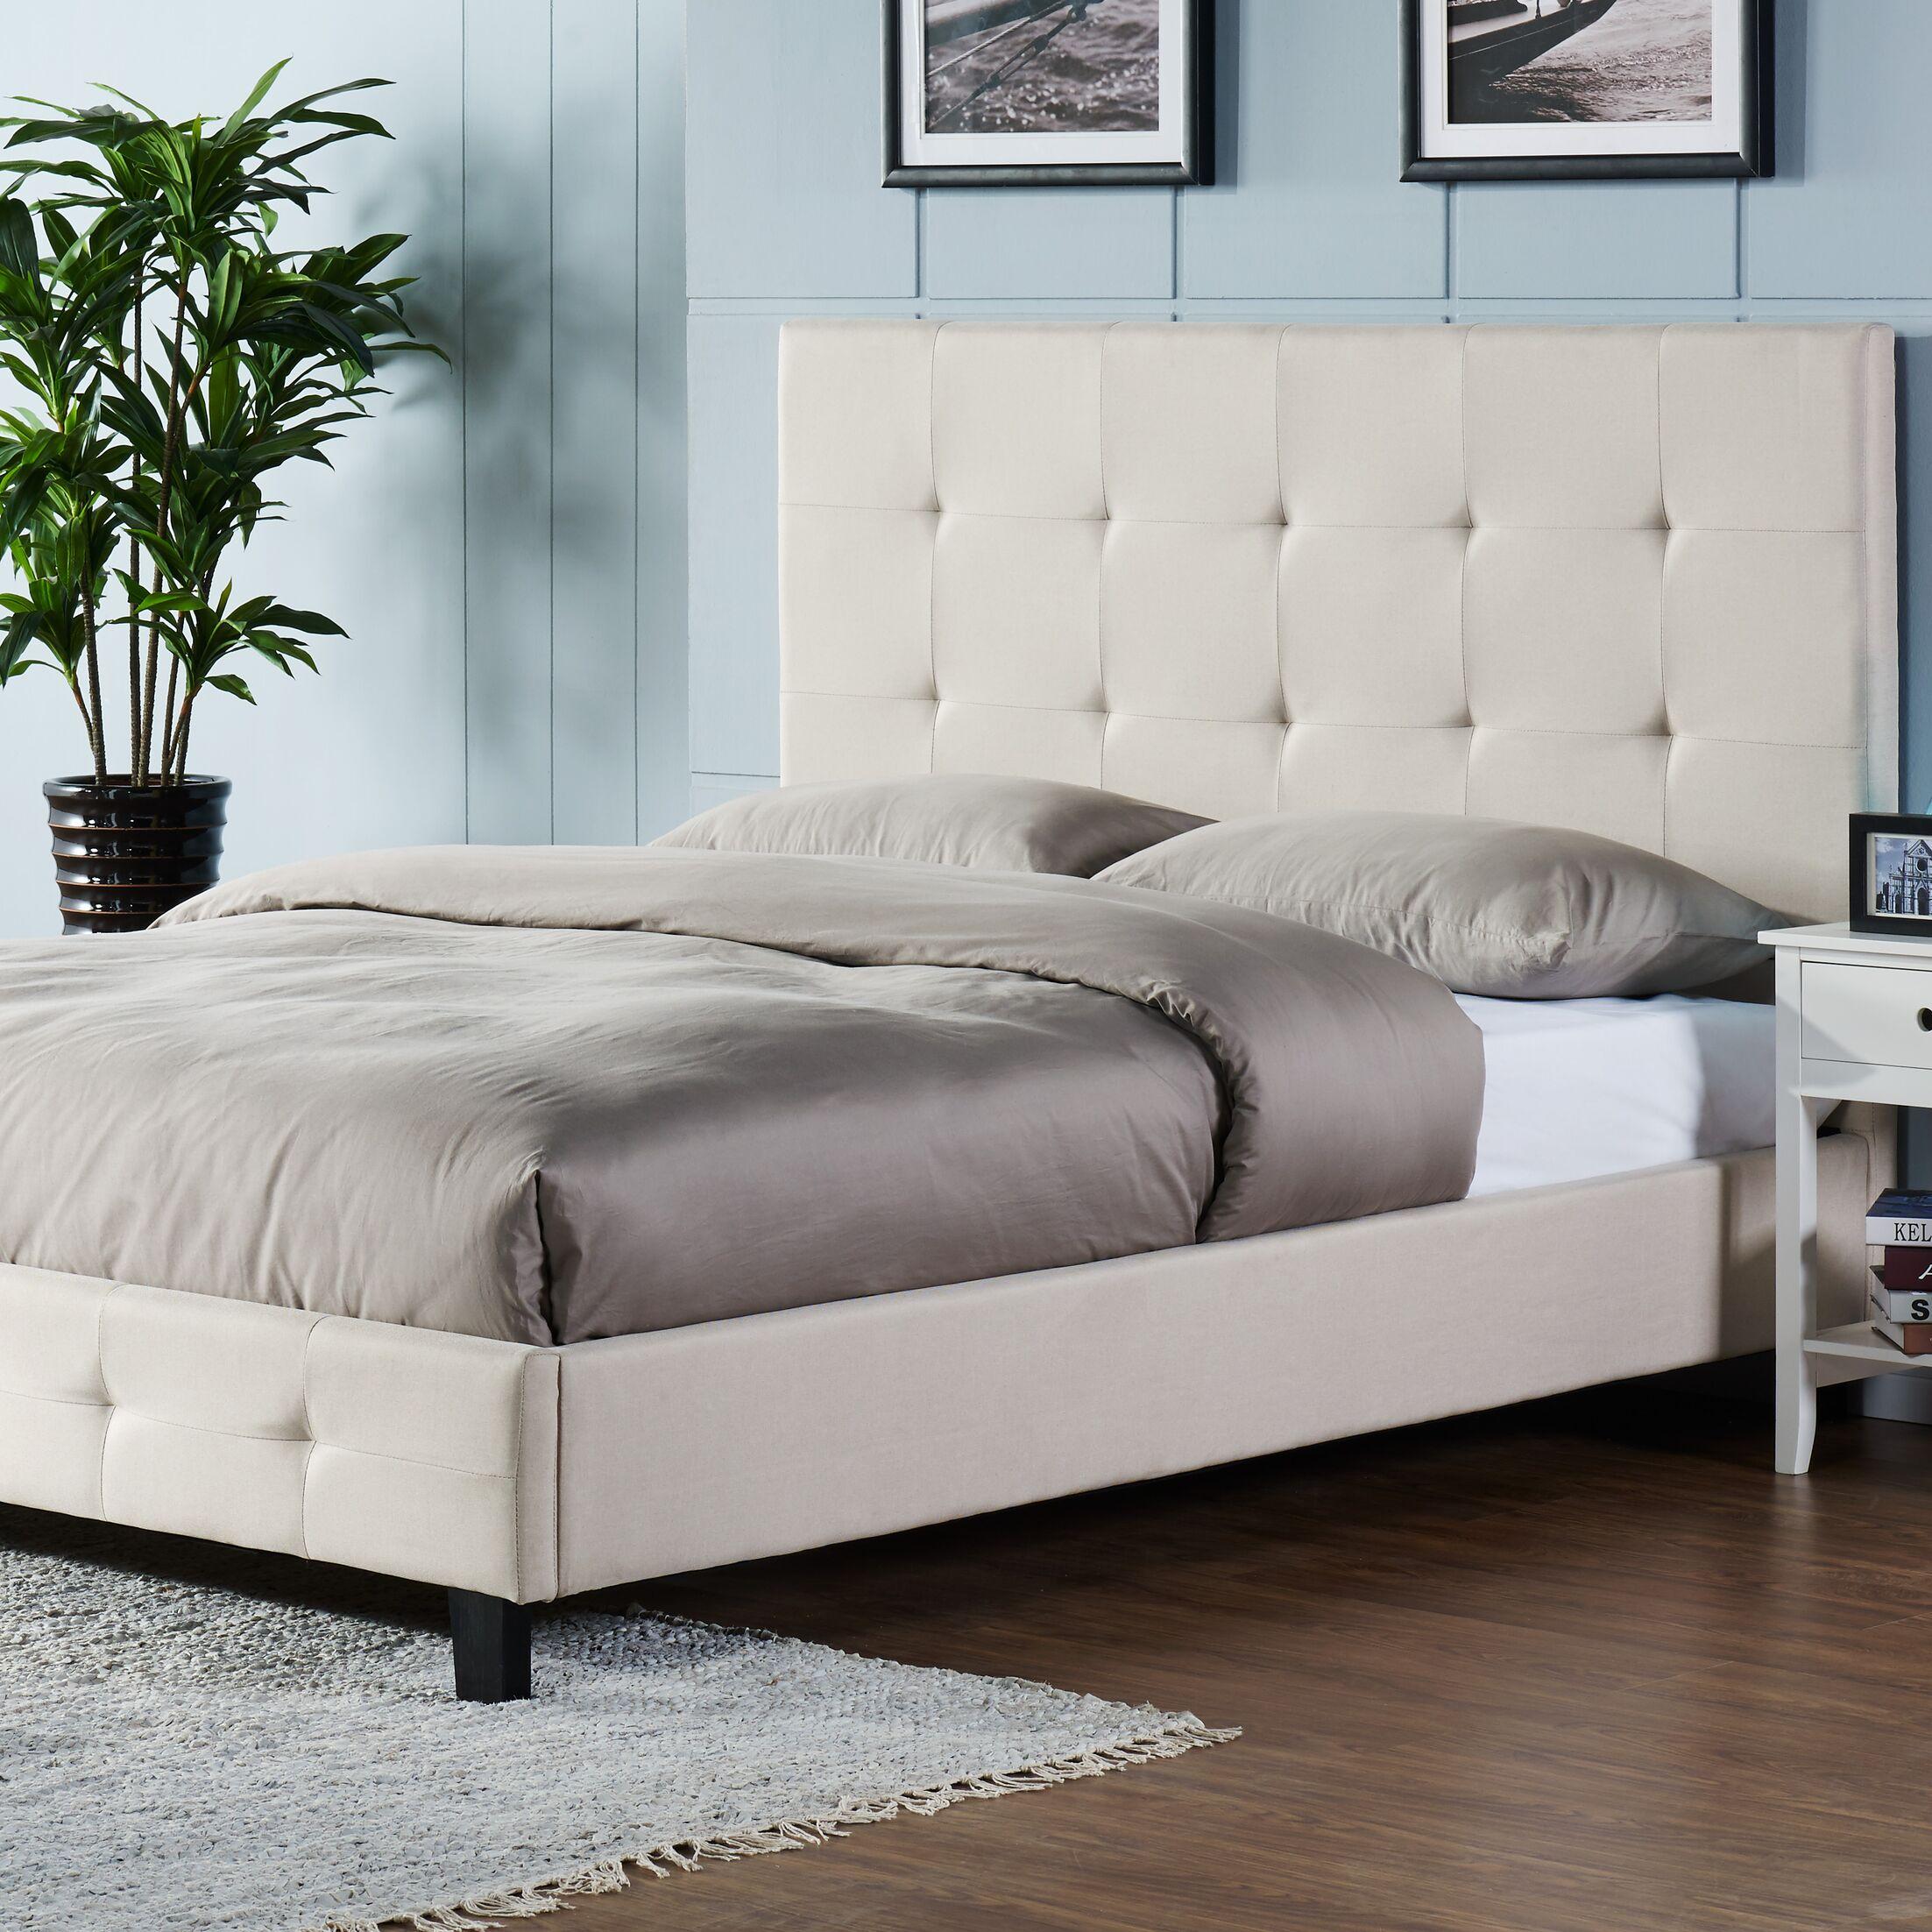 Tiara Upholstered Platform Bed Size: California King, Color: Bone